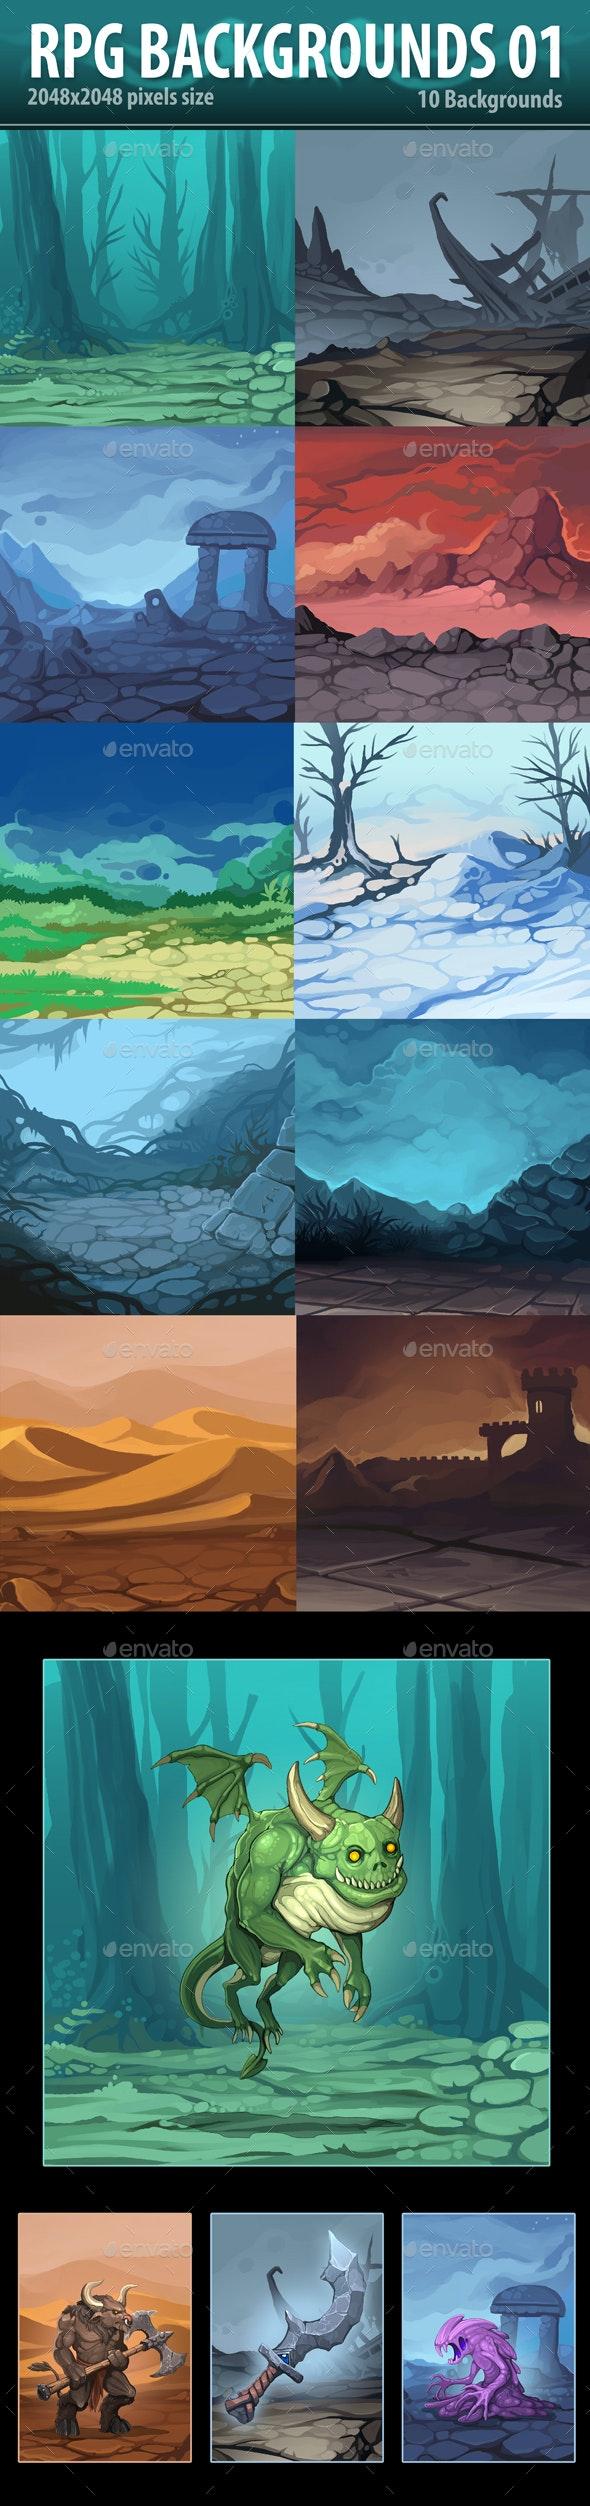 RPG Backgrounds 01 - Backgrounds Game Assets